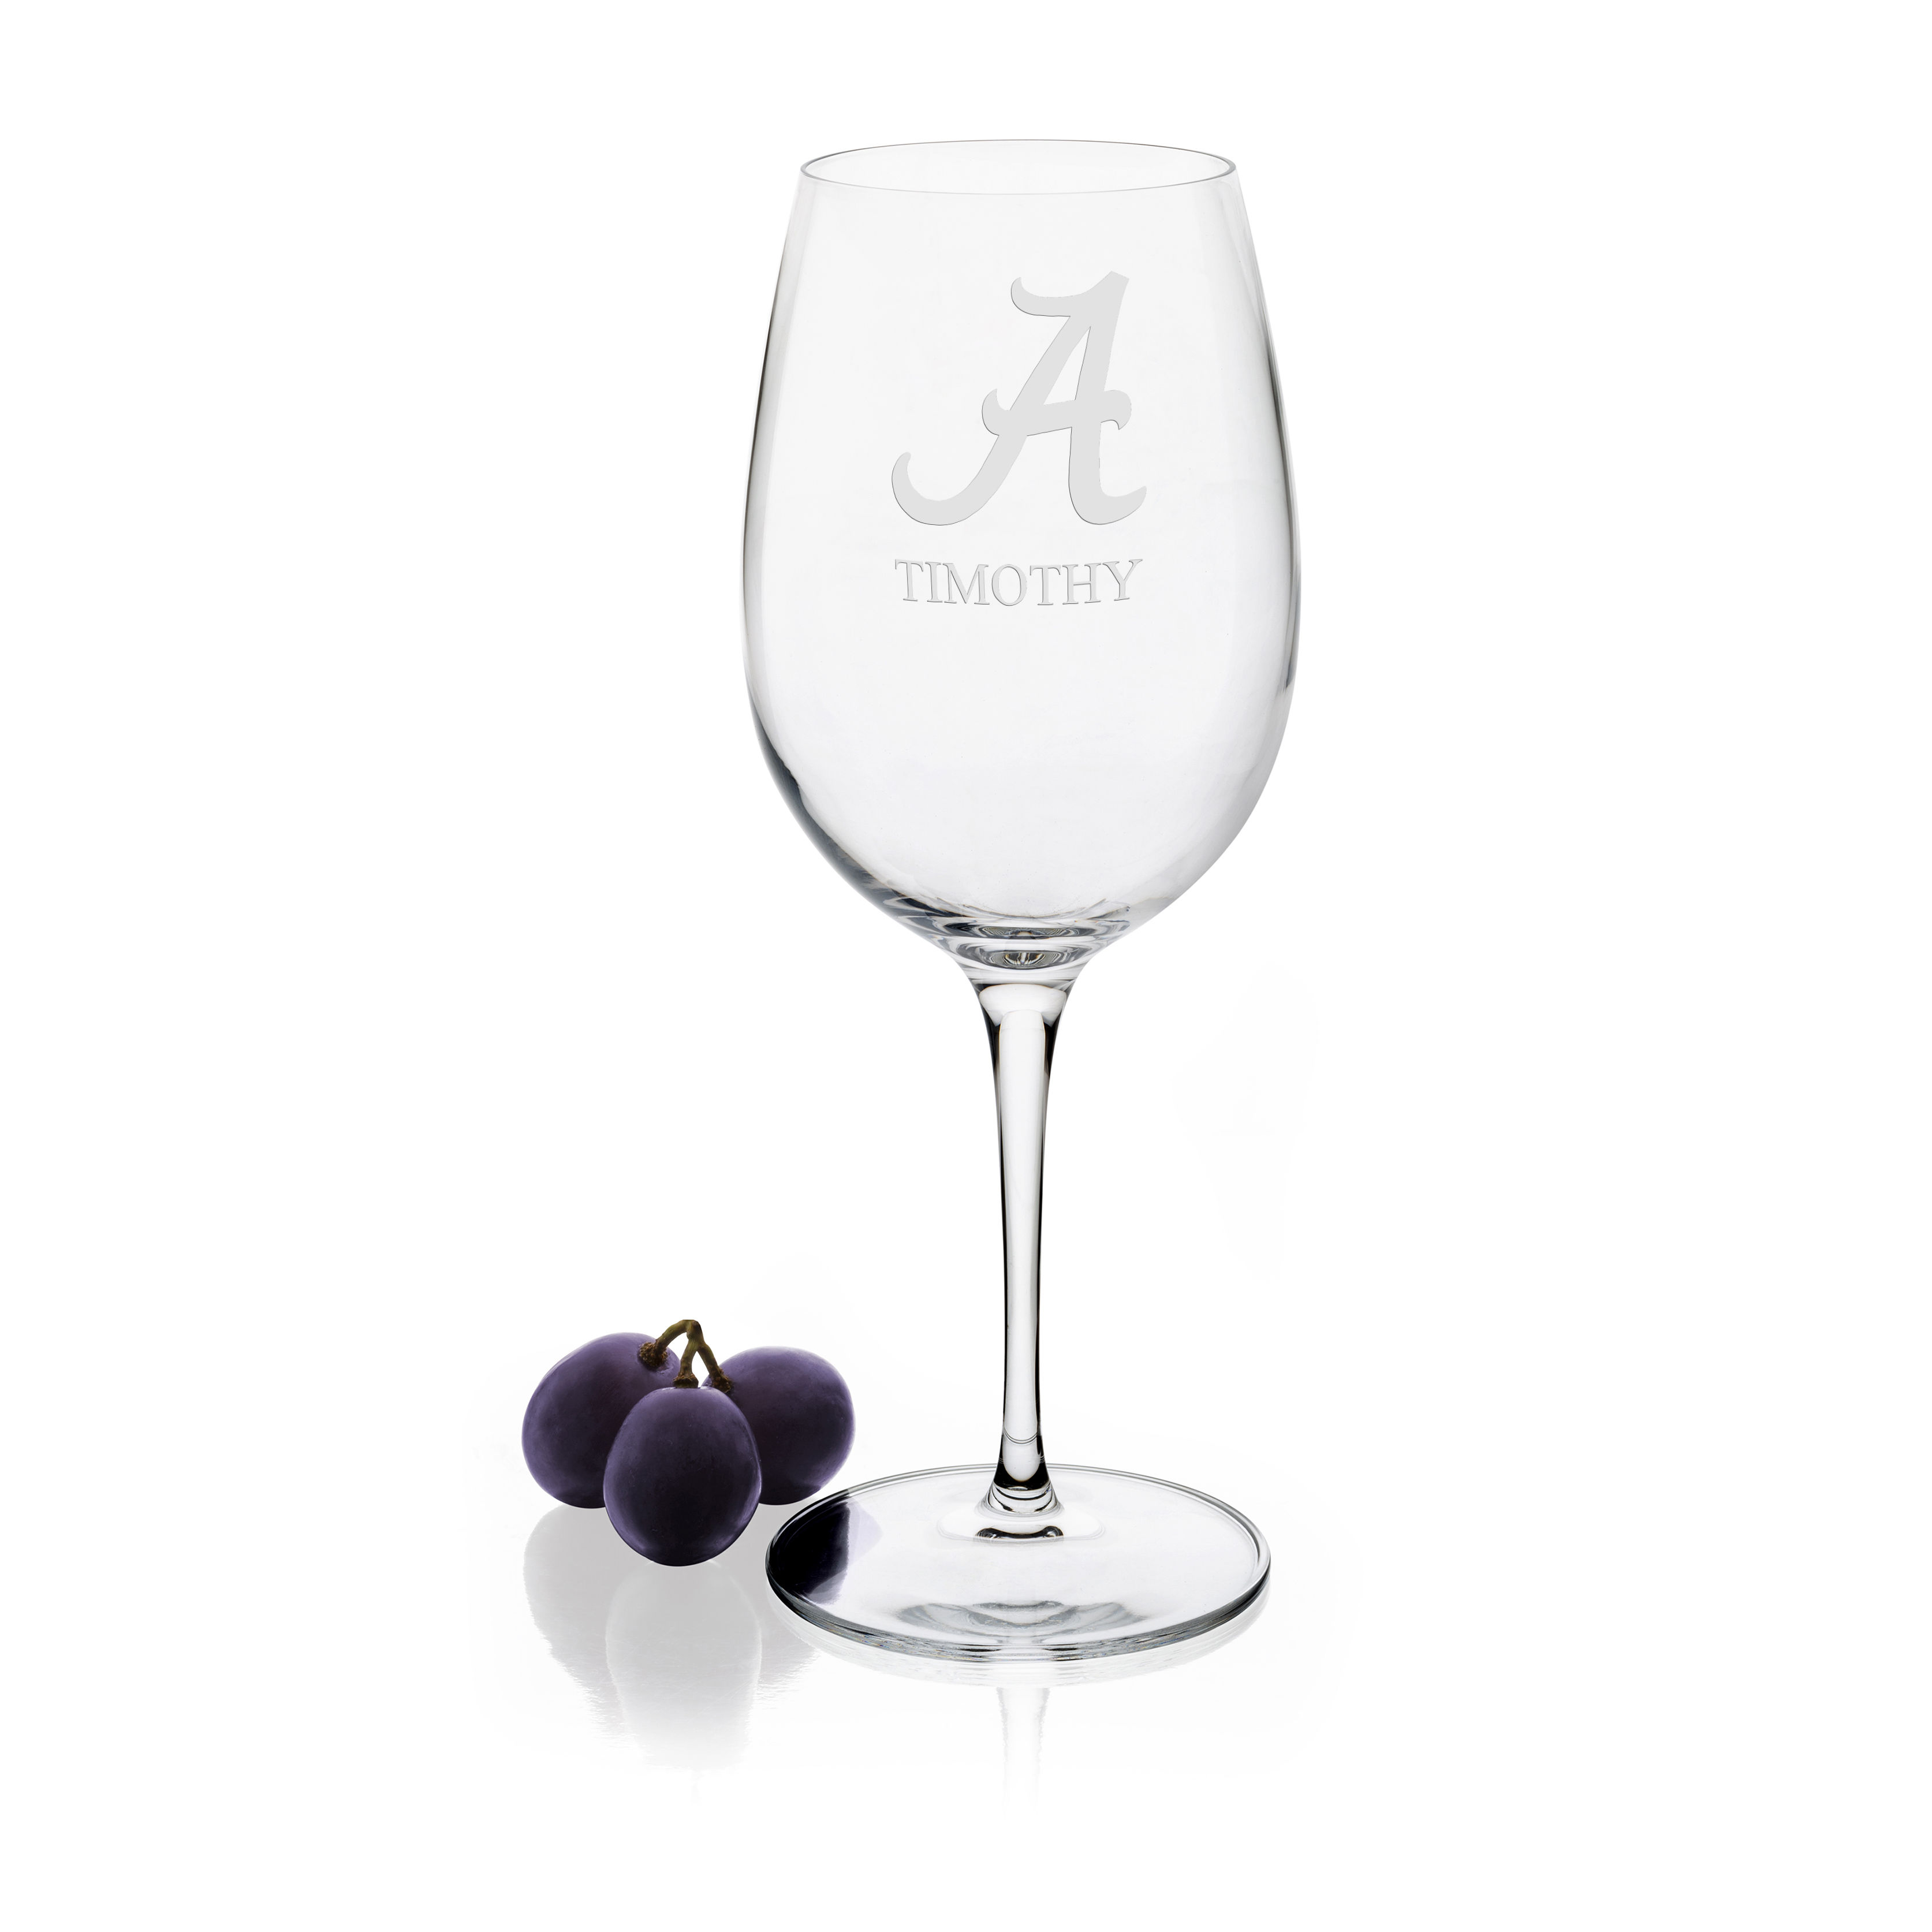 Alabama Red Wine Glasses - Set of 2